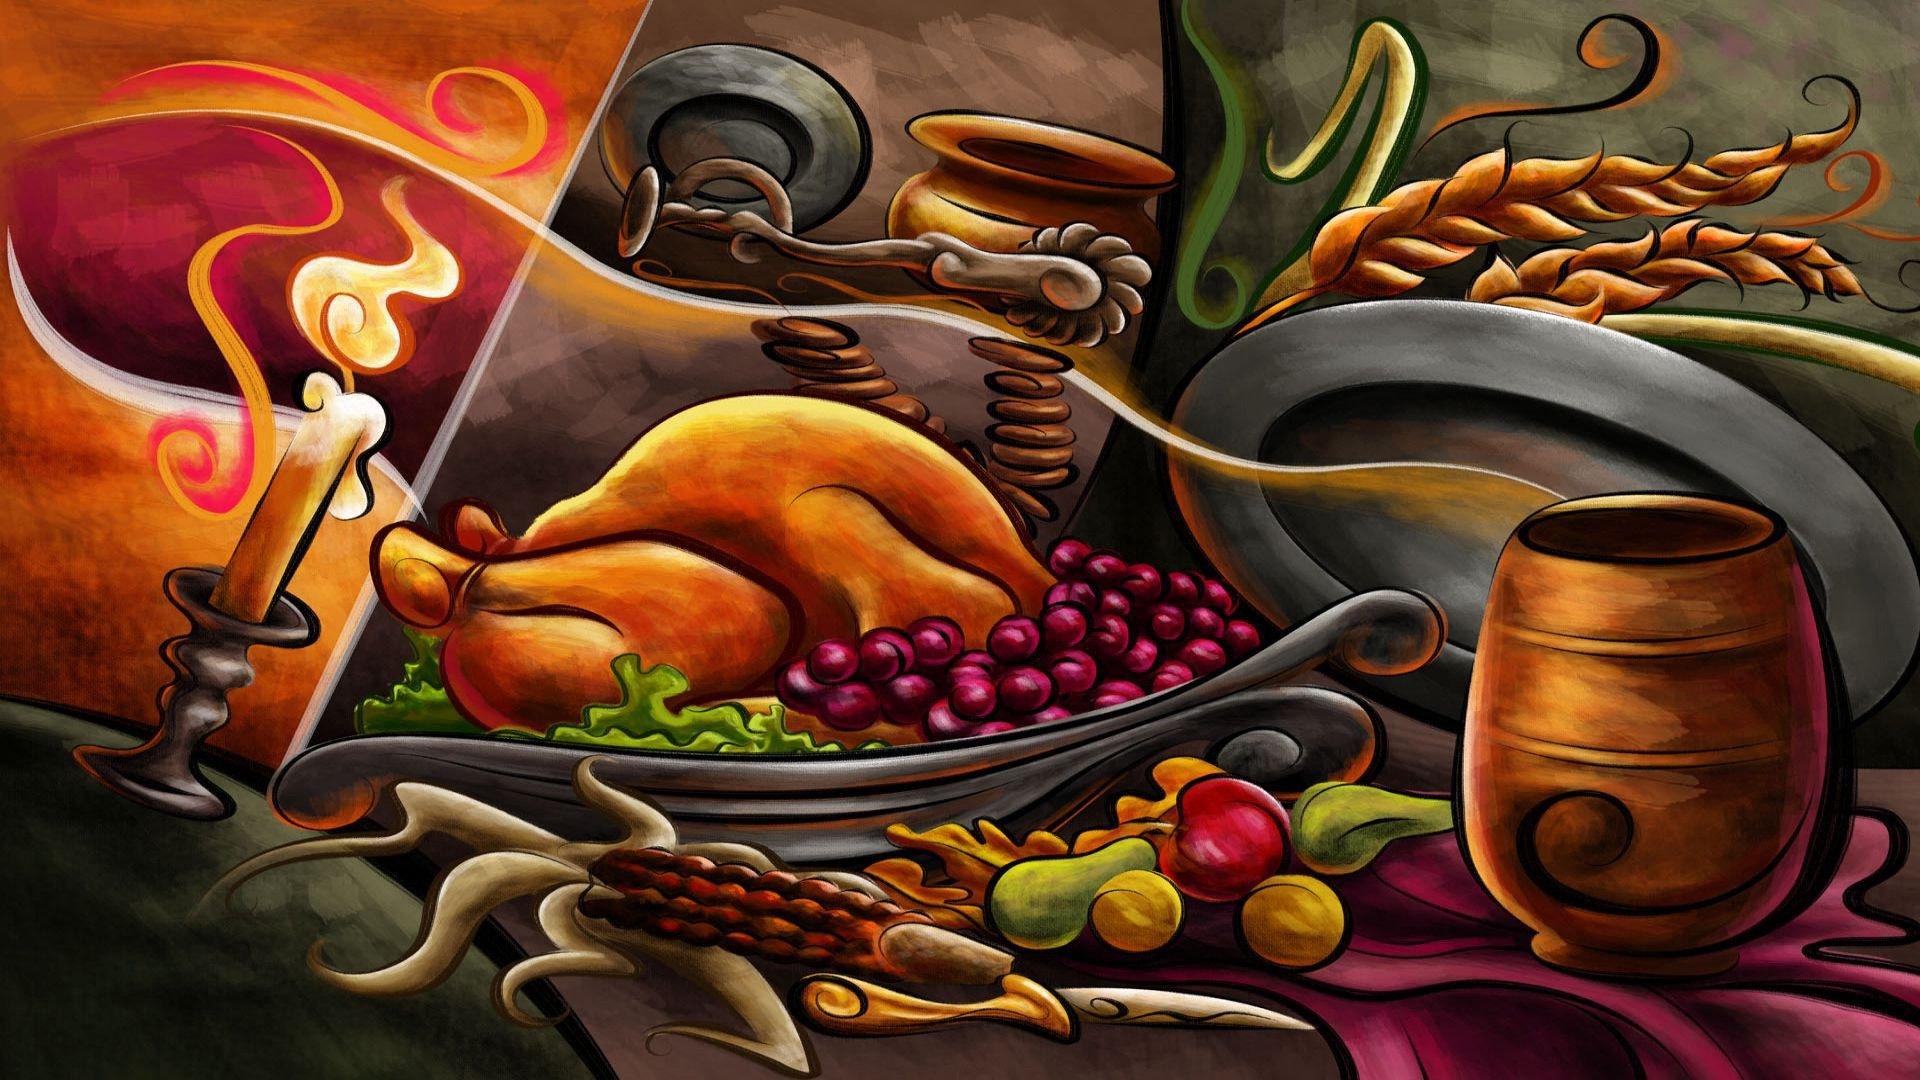 Thanksgiving Wallpaper